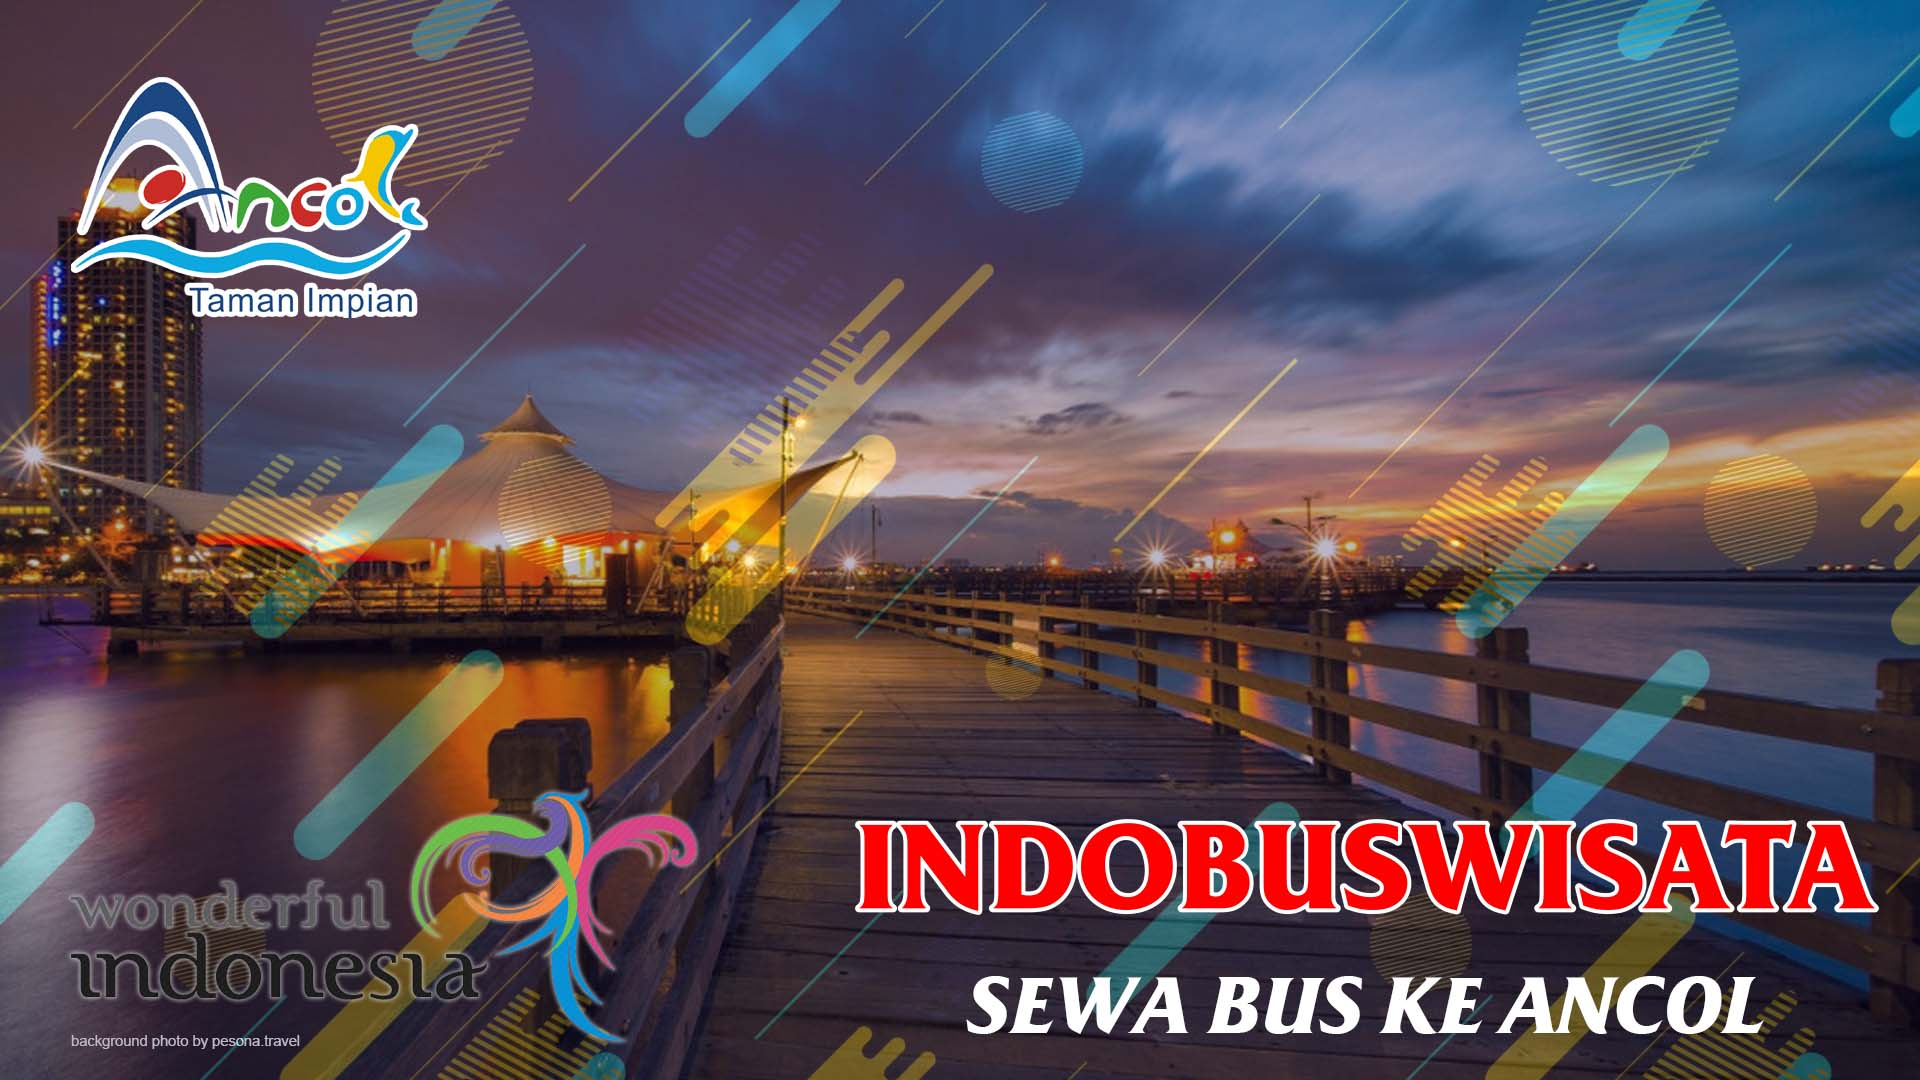 Sewa Bus Ke Ancol - Indobuswisata